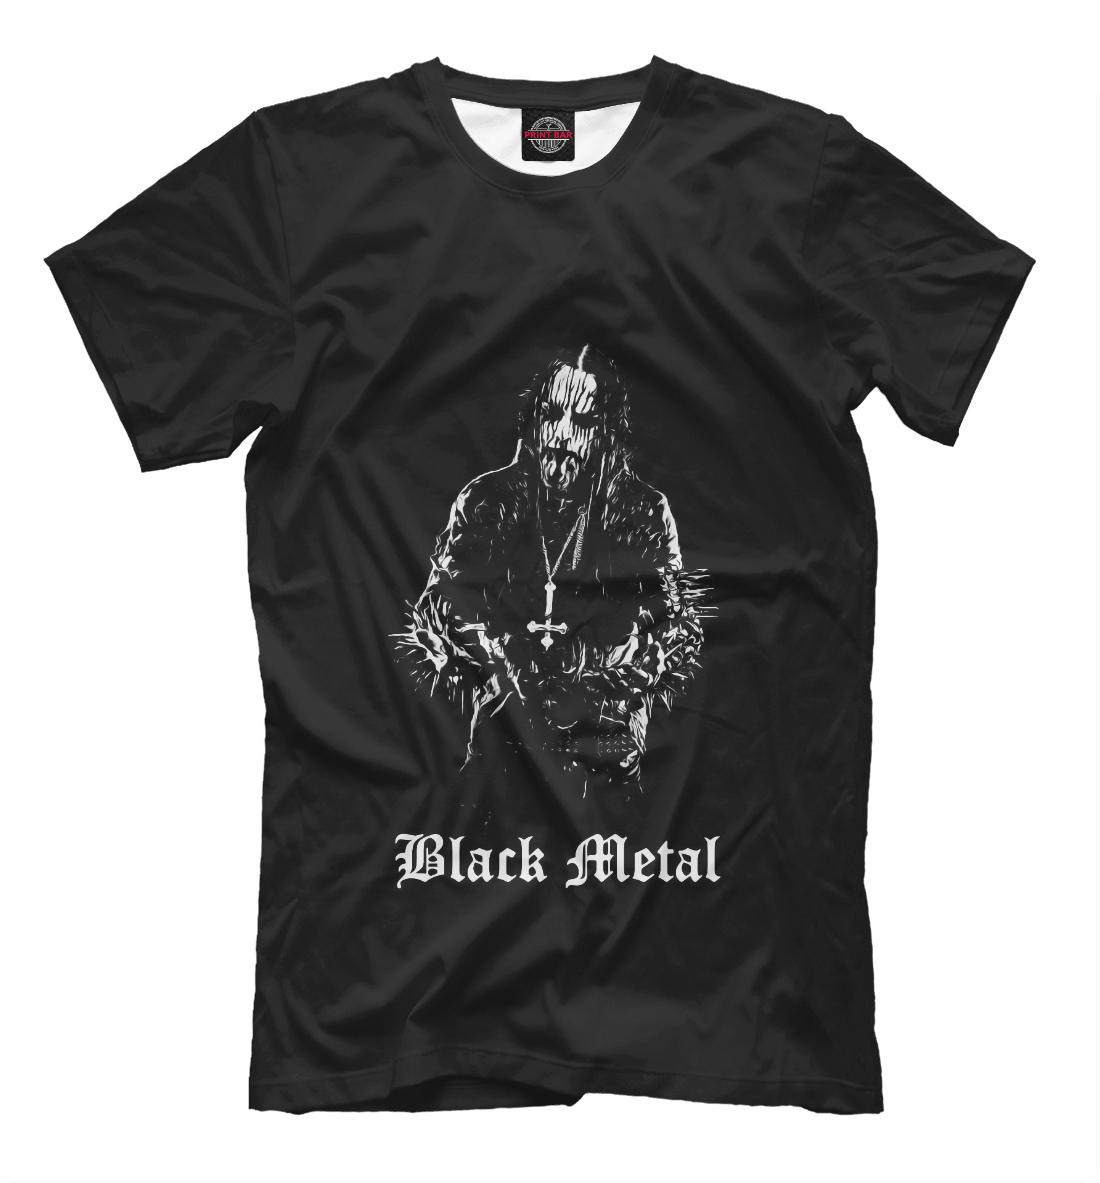 Купить Black Metal, Printbar, Футболки, MZK-885762-fut-2